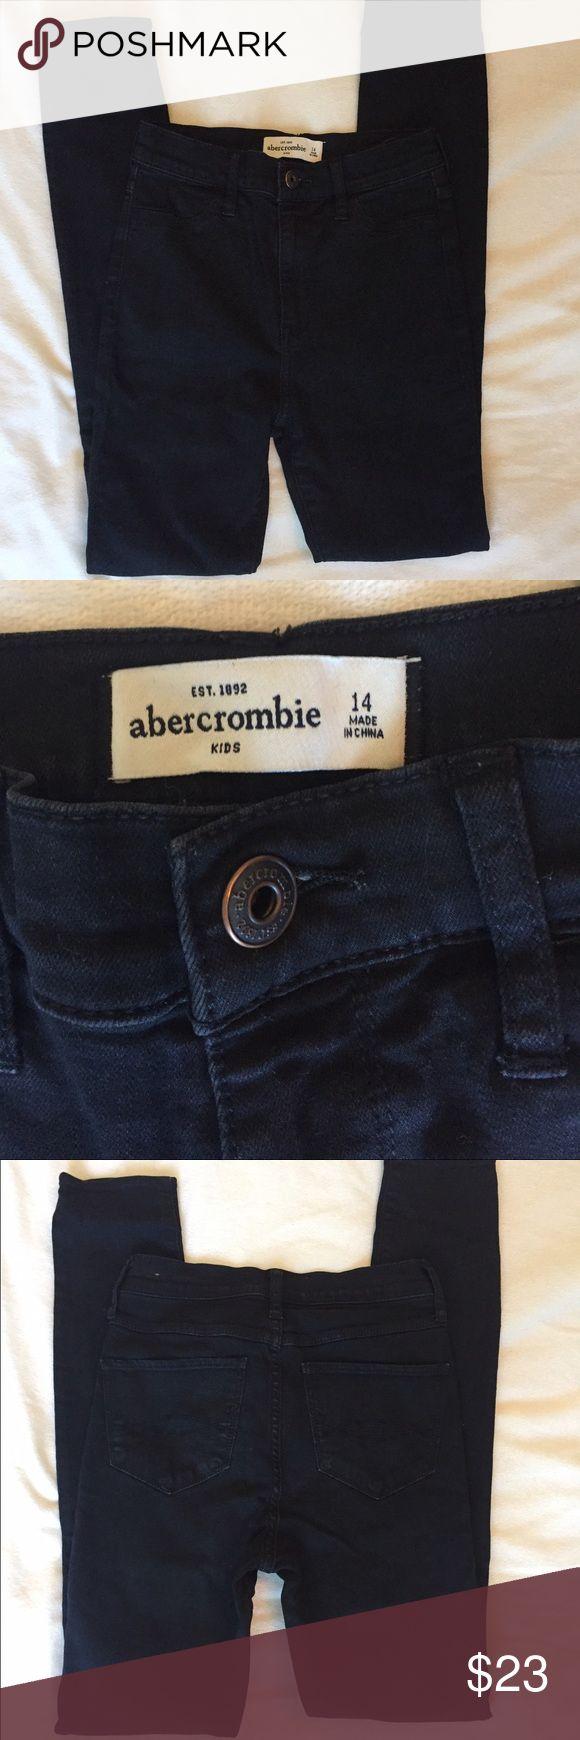 Black Abercrombie jeggings skinny fit girls 14 Perfect condition. Black skinny fit. Abercrombie stretchy jeggings. Girls size 14. Abercrombie & Fitch Bottoms Jeans